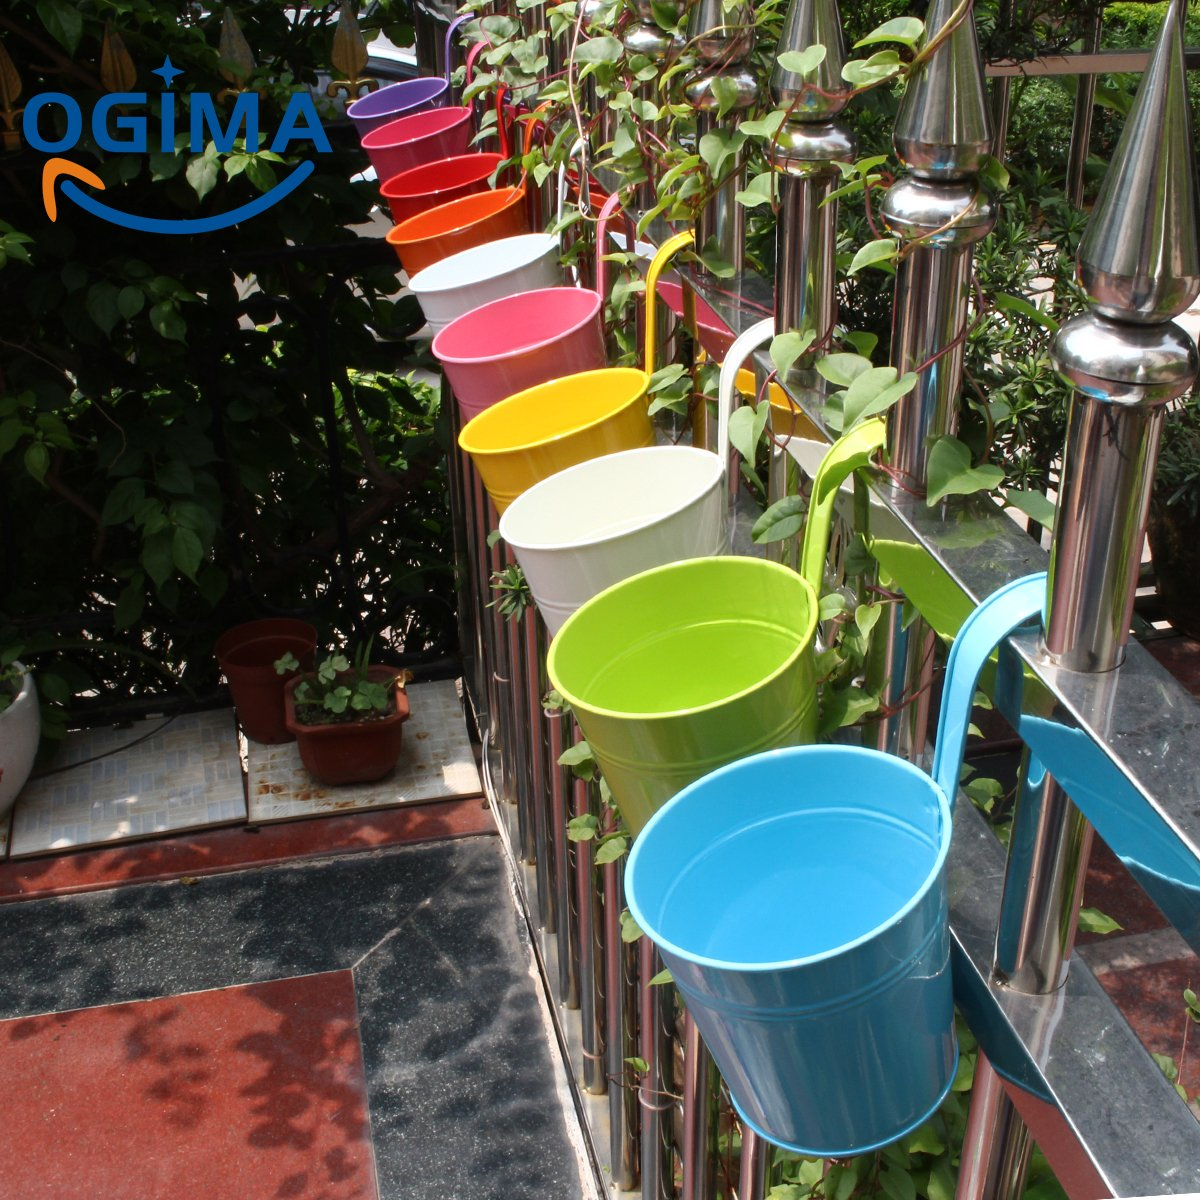 10 x Metal Iron Flower Pot Vase Hanging Balcony Garden Planter Home Decor OGIMA